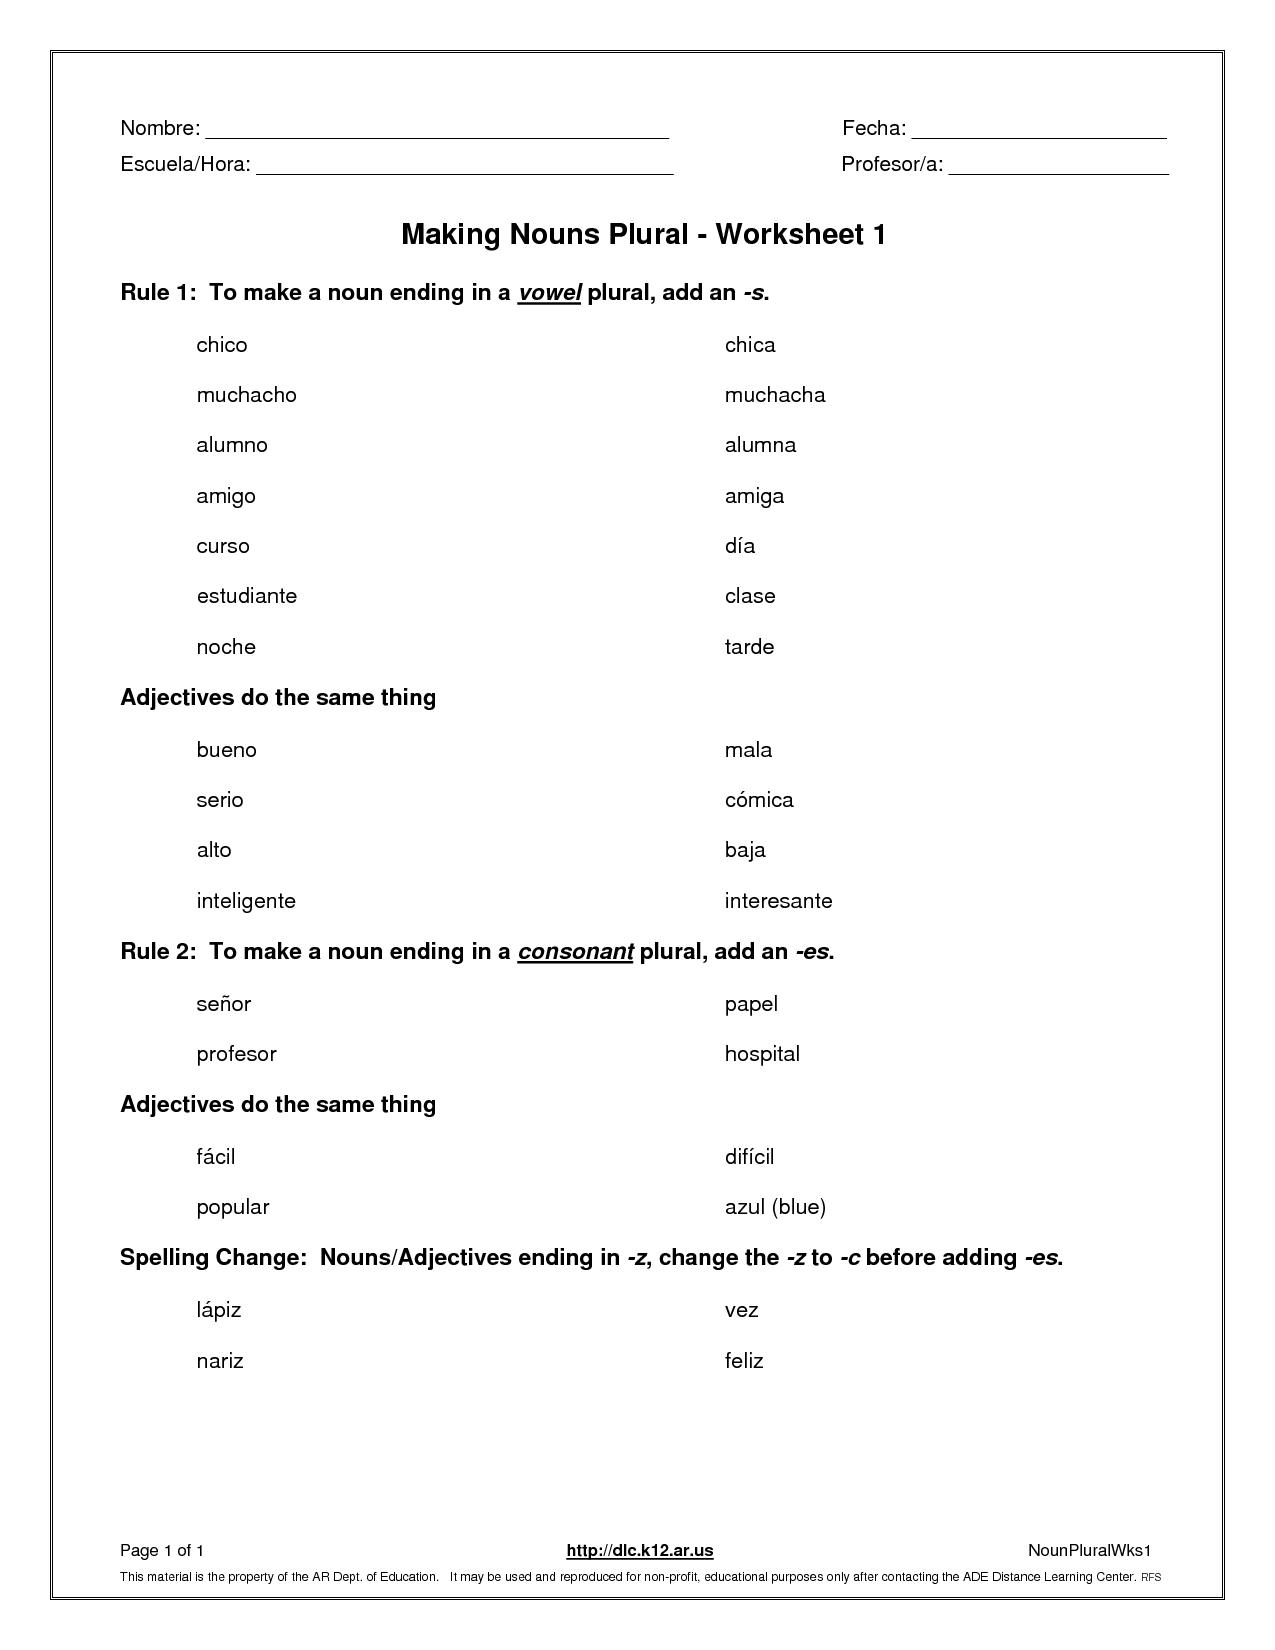 Singular And Plural Possessive Nouns Worksheets 4th Grade